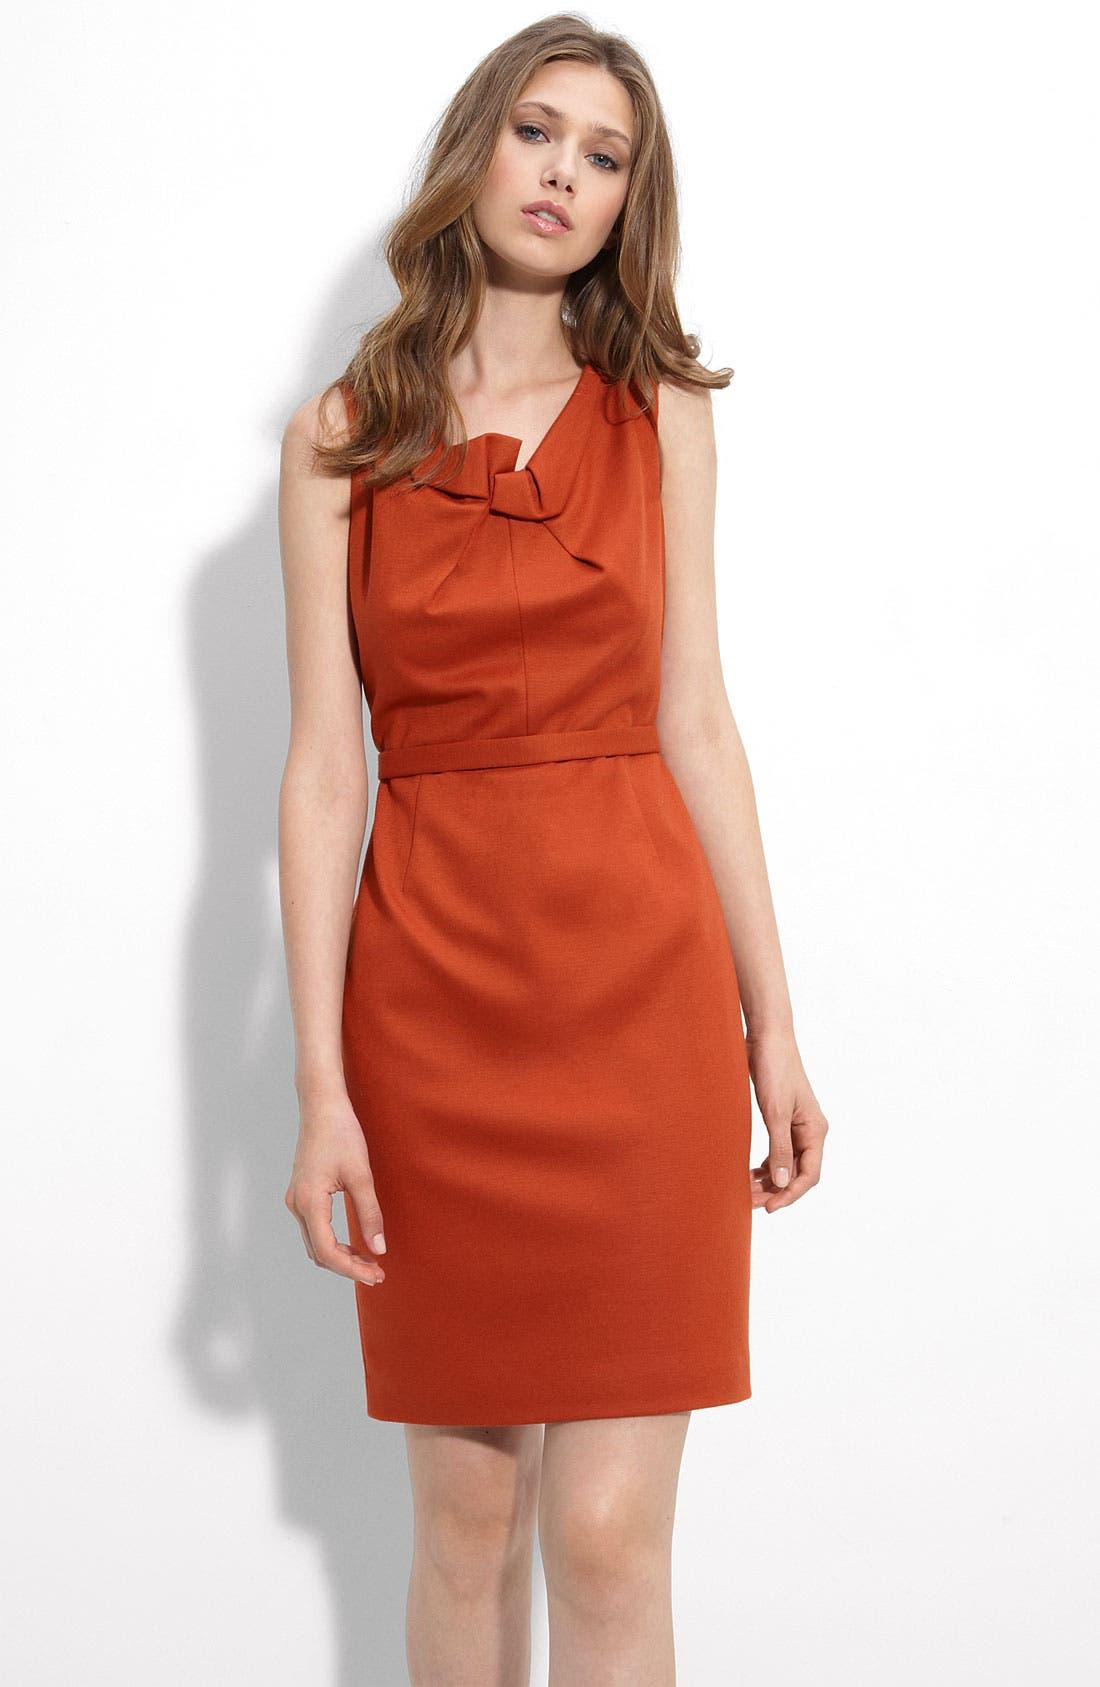 Alternate Image 1 Selected - Elie Tahari Exclusive for Nordstrom 'Lori' Dress